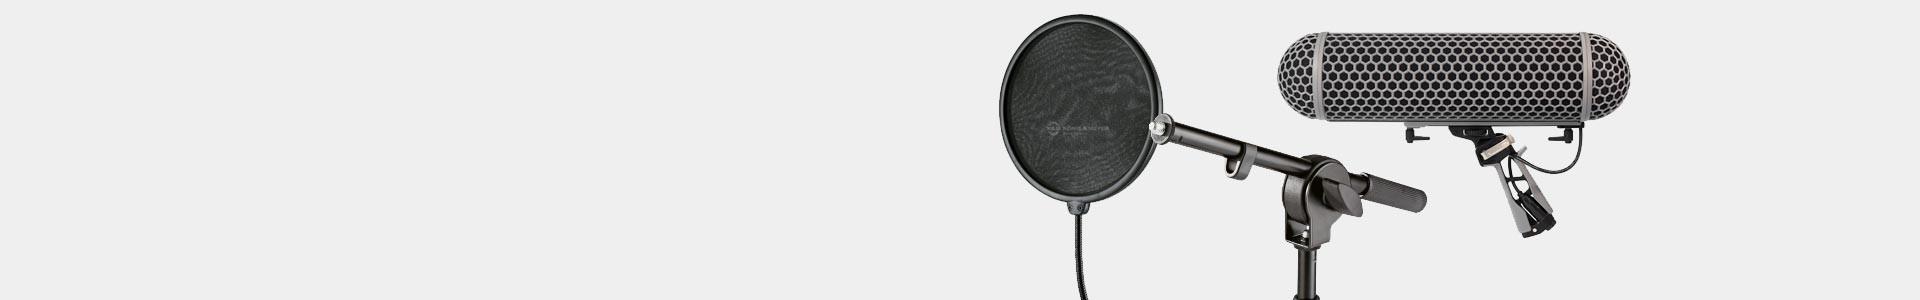 Todo tipo de accesorios para micrófonos profesionales - Avacab